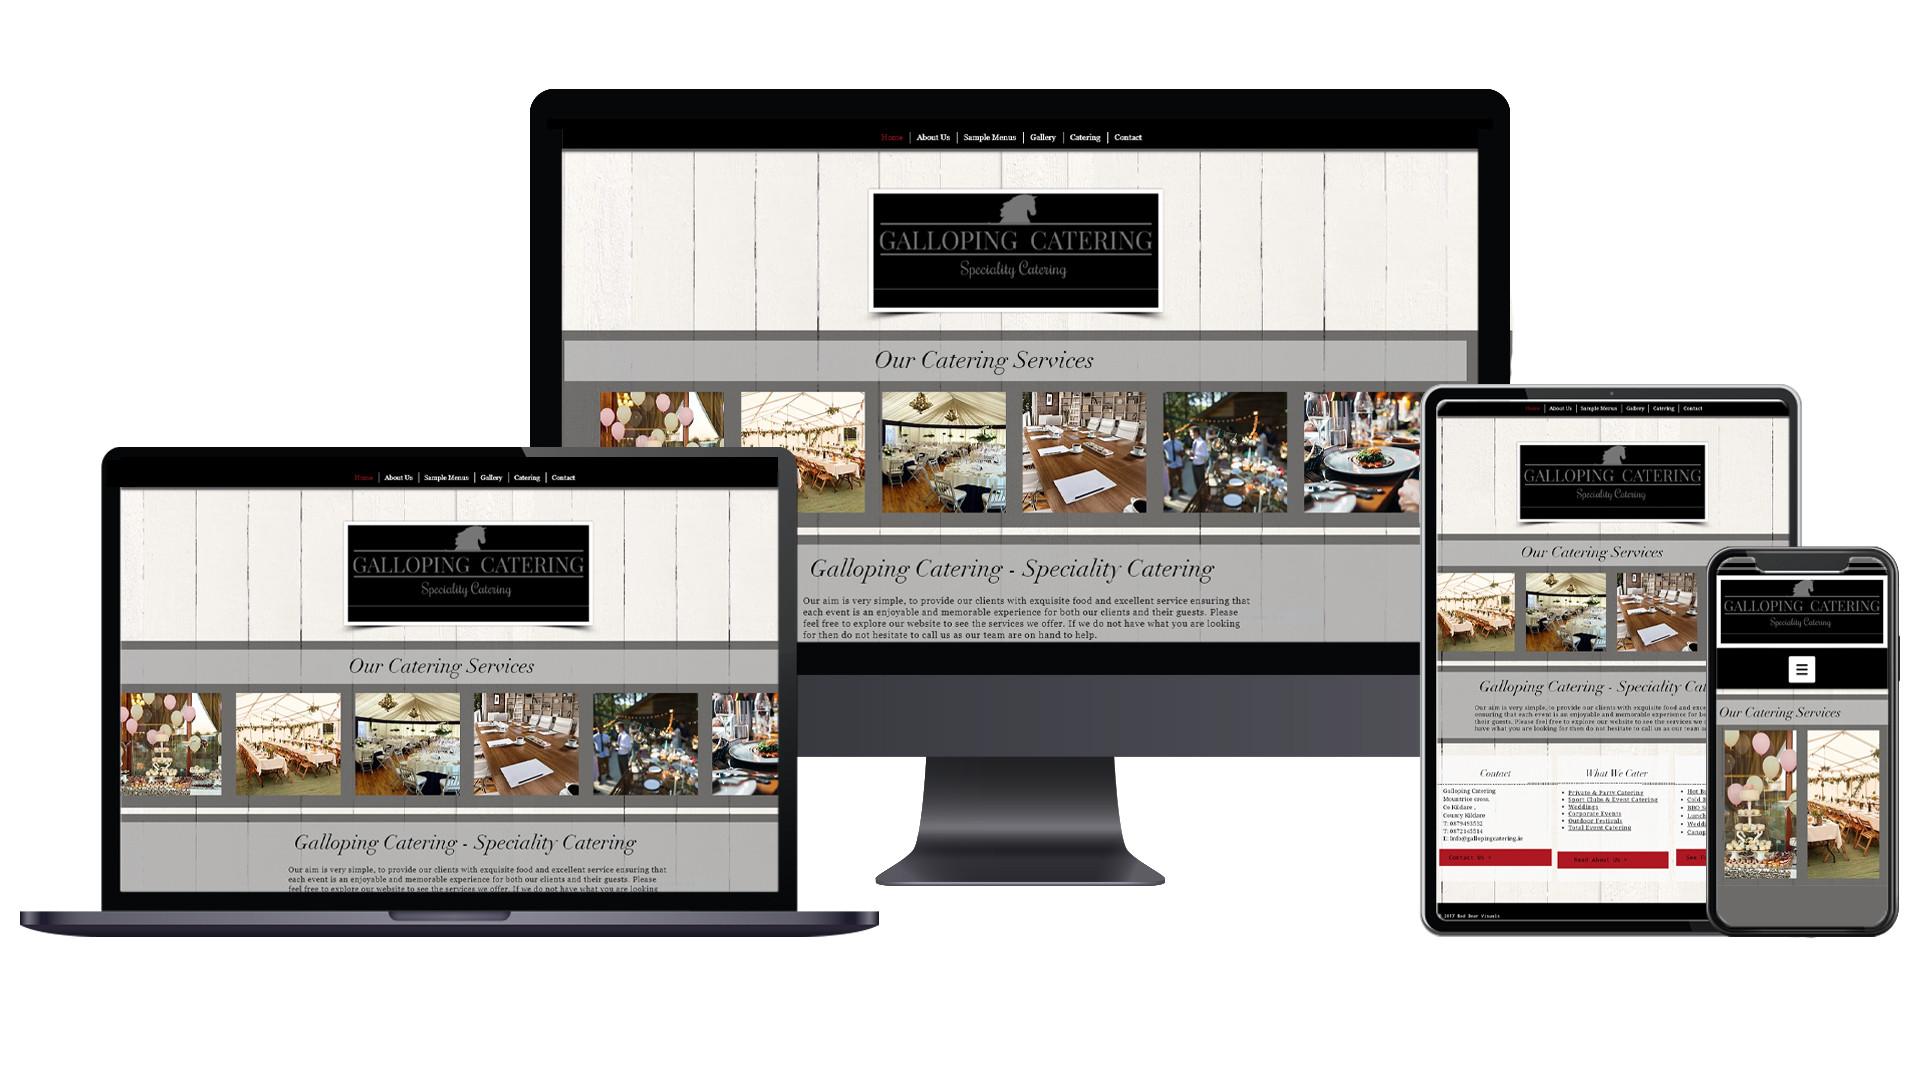 Galloping catering website portfolio.jpg